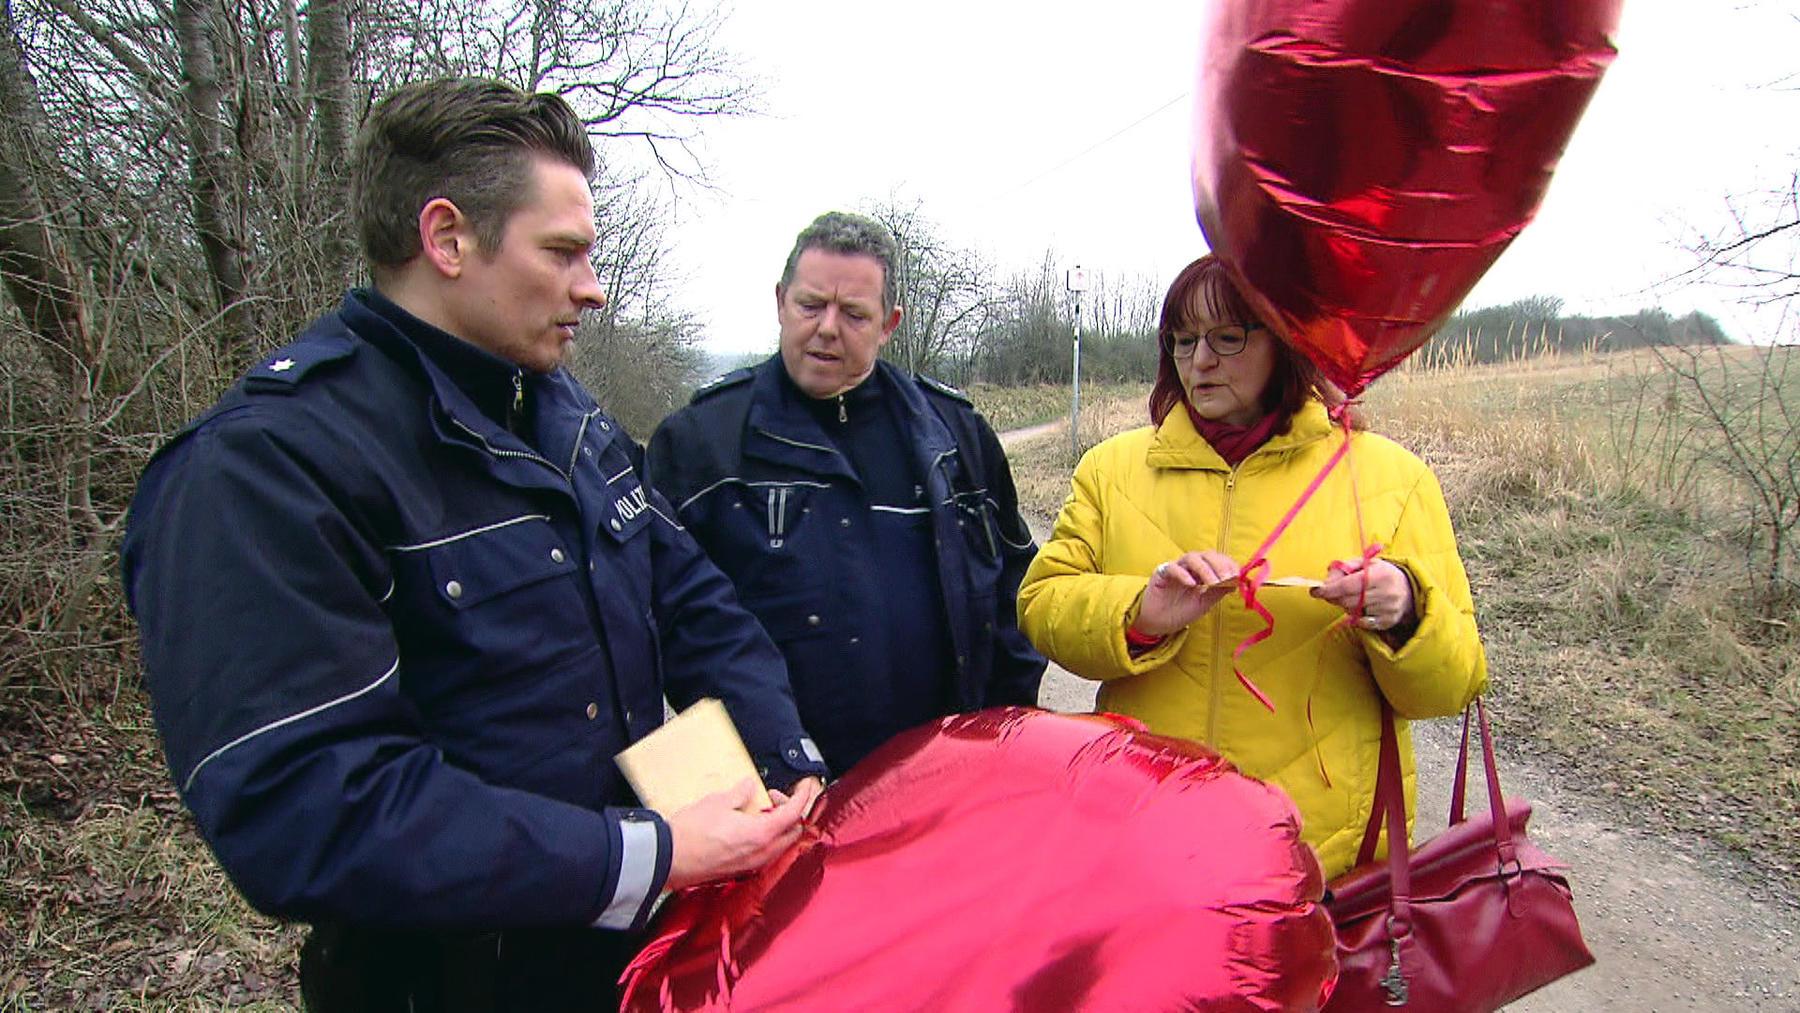 Luftballon mit Morddrohung / Falsche Bestatter überfallen Rentnerin | Folge 52